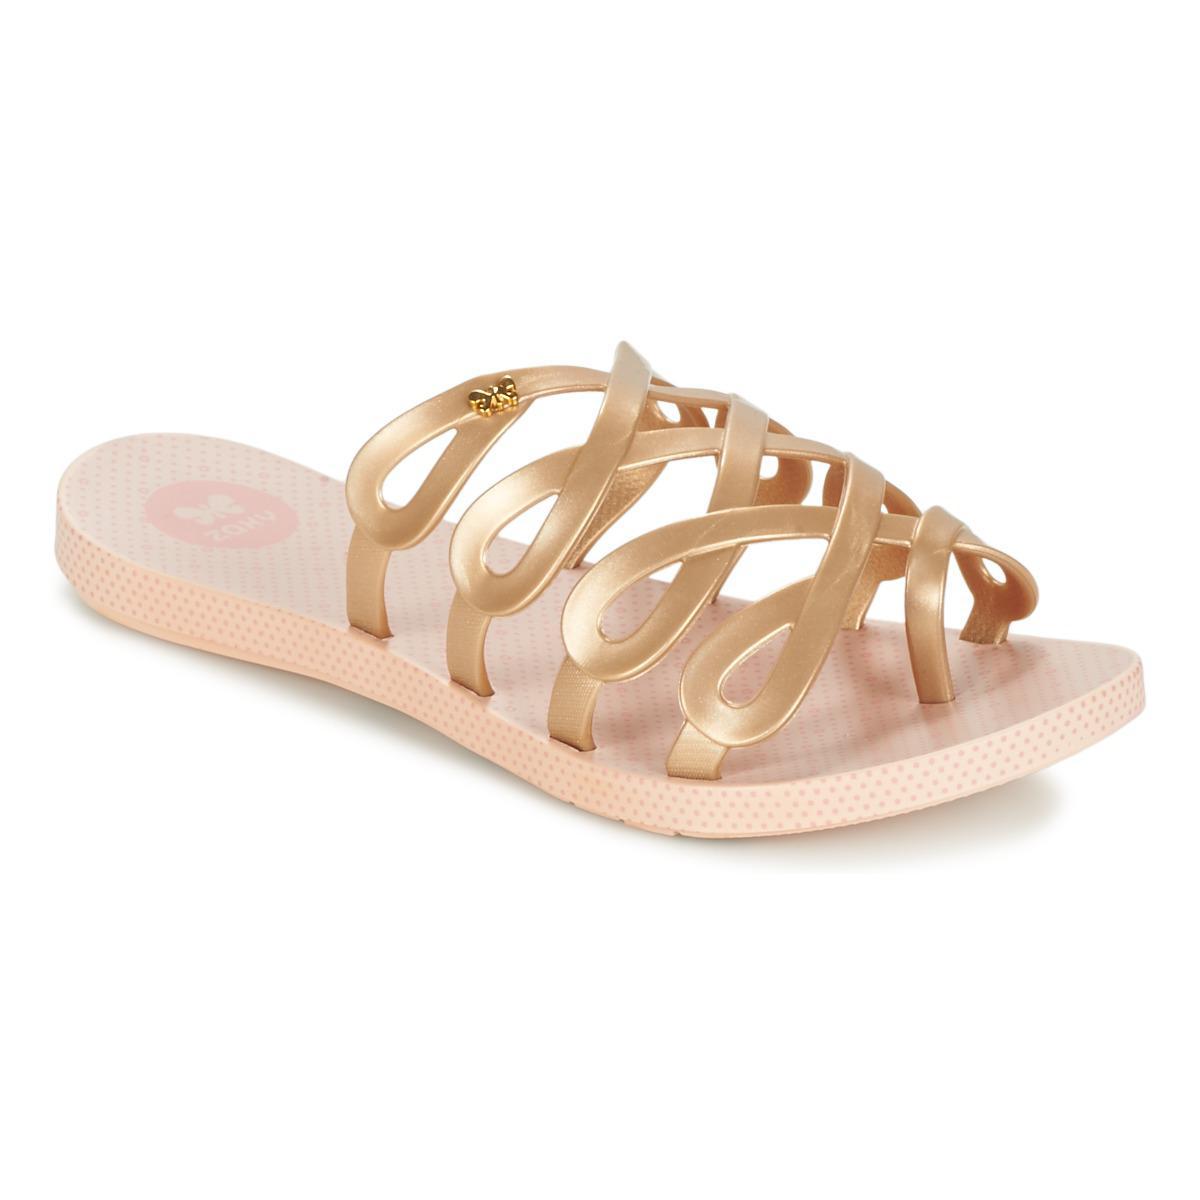 c4ba9bbd856c Zaxy Infinity Women s Flip Flops   Sandals (shoes) In Gold in ...